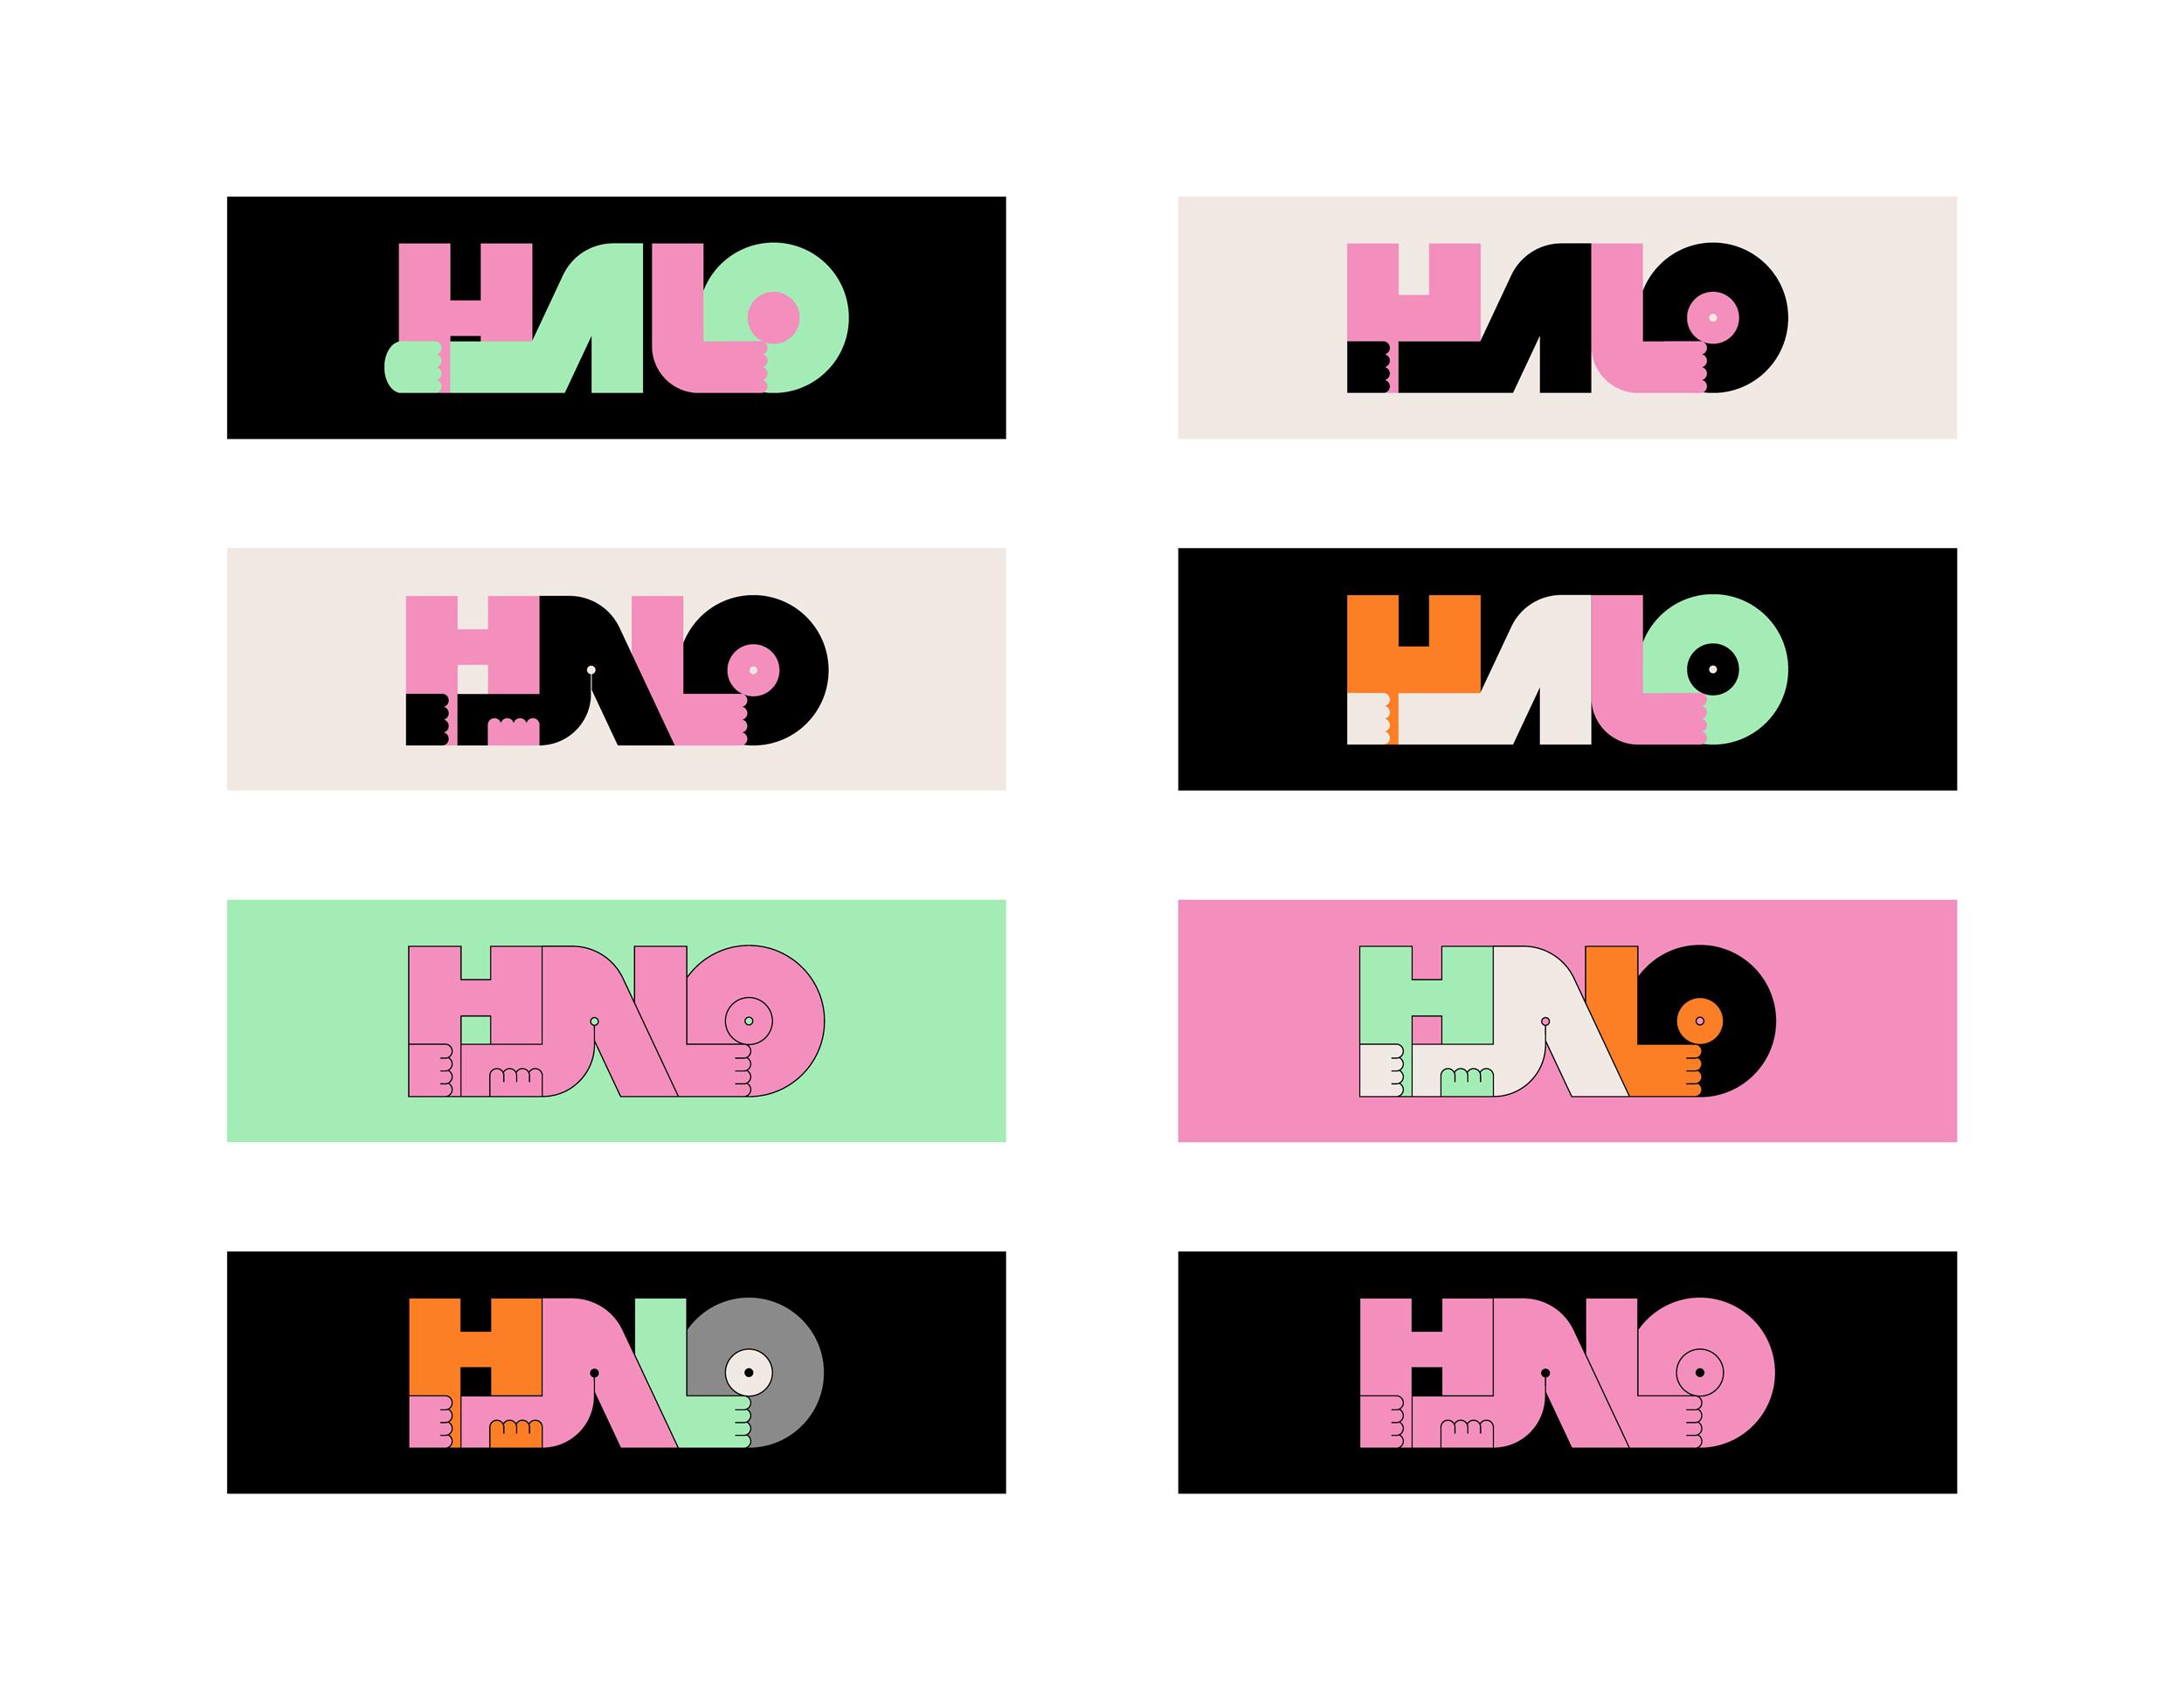 HALO_Justin-Harder_04.jpg